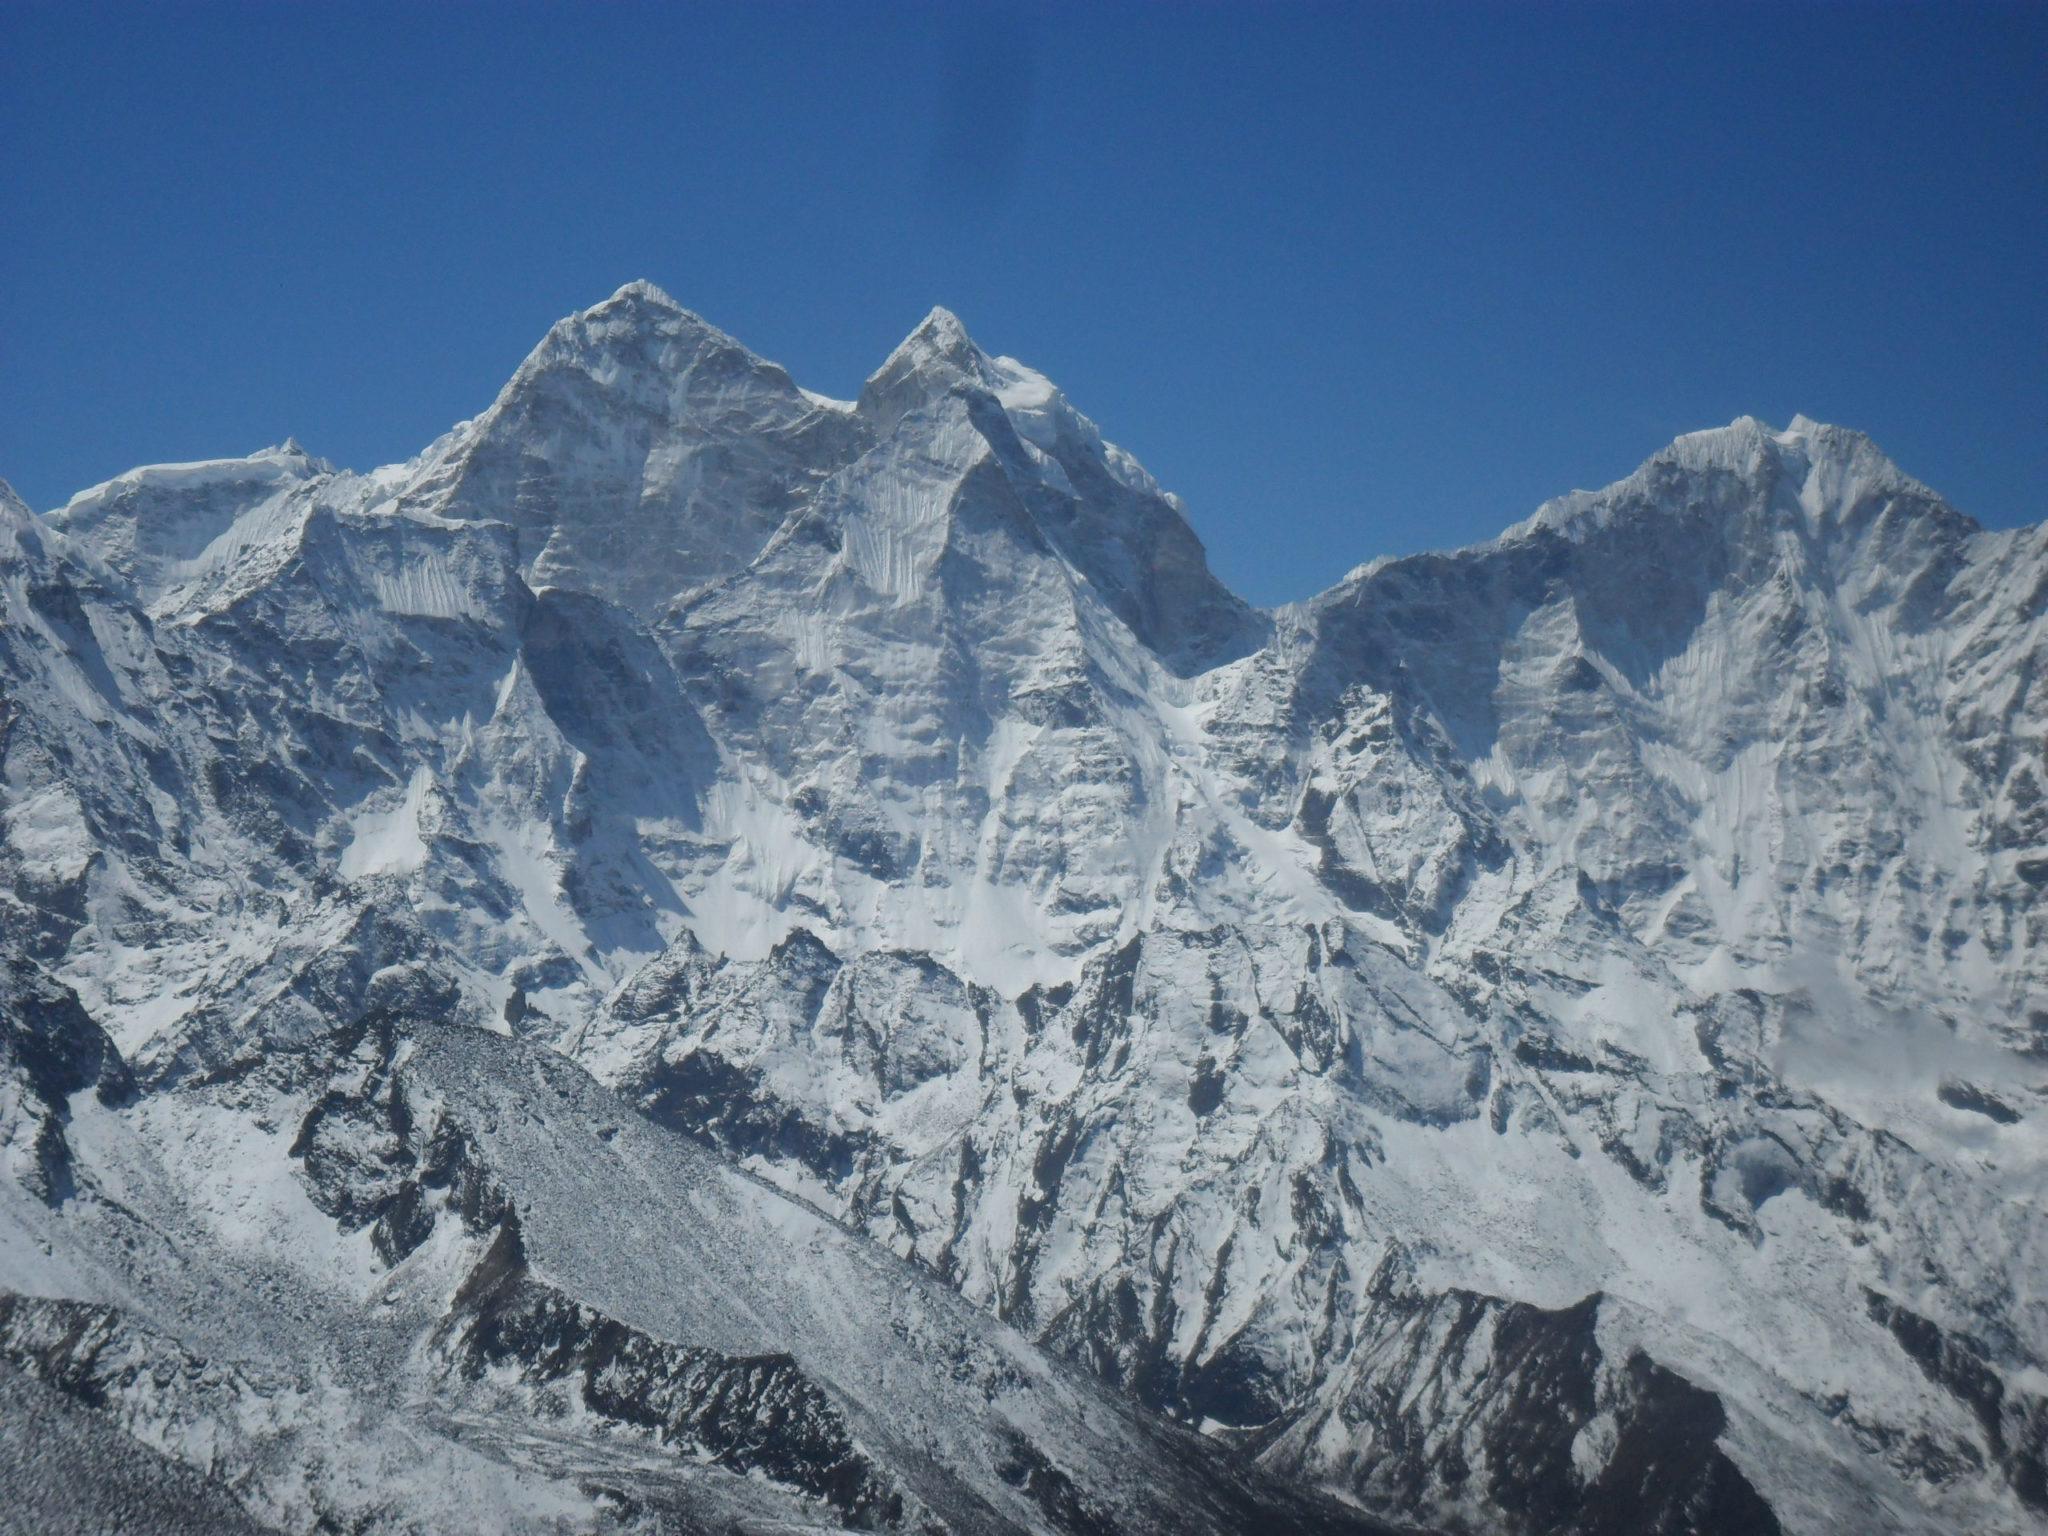 Nepal trekking holiday: Everest Base Camp Trek